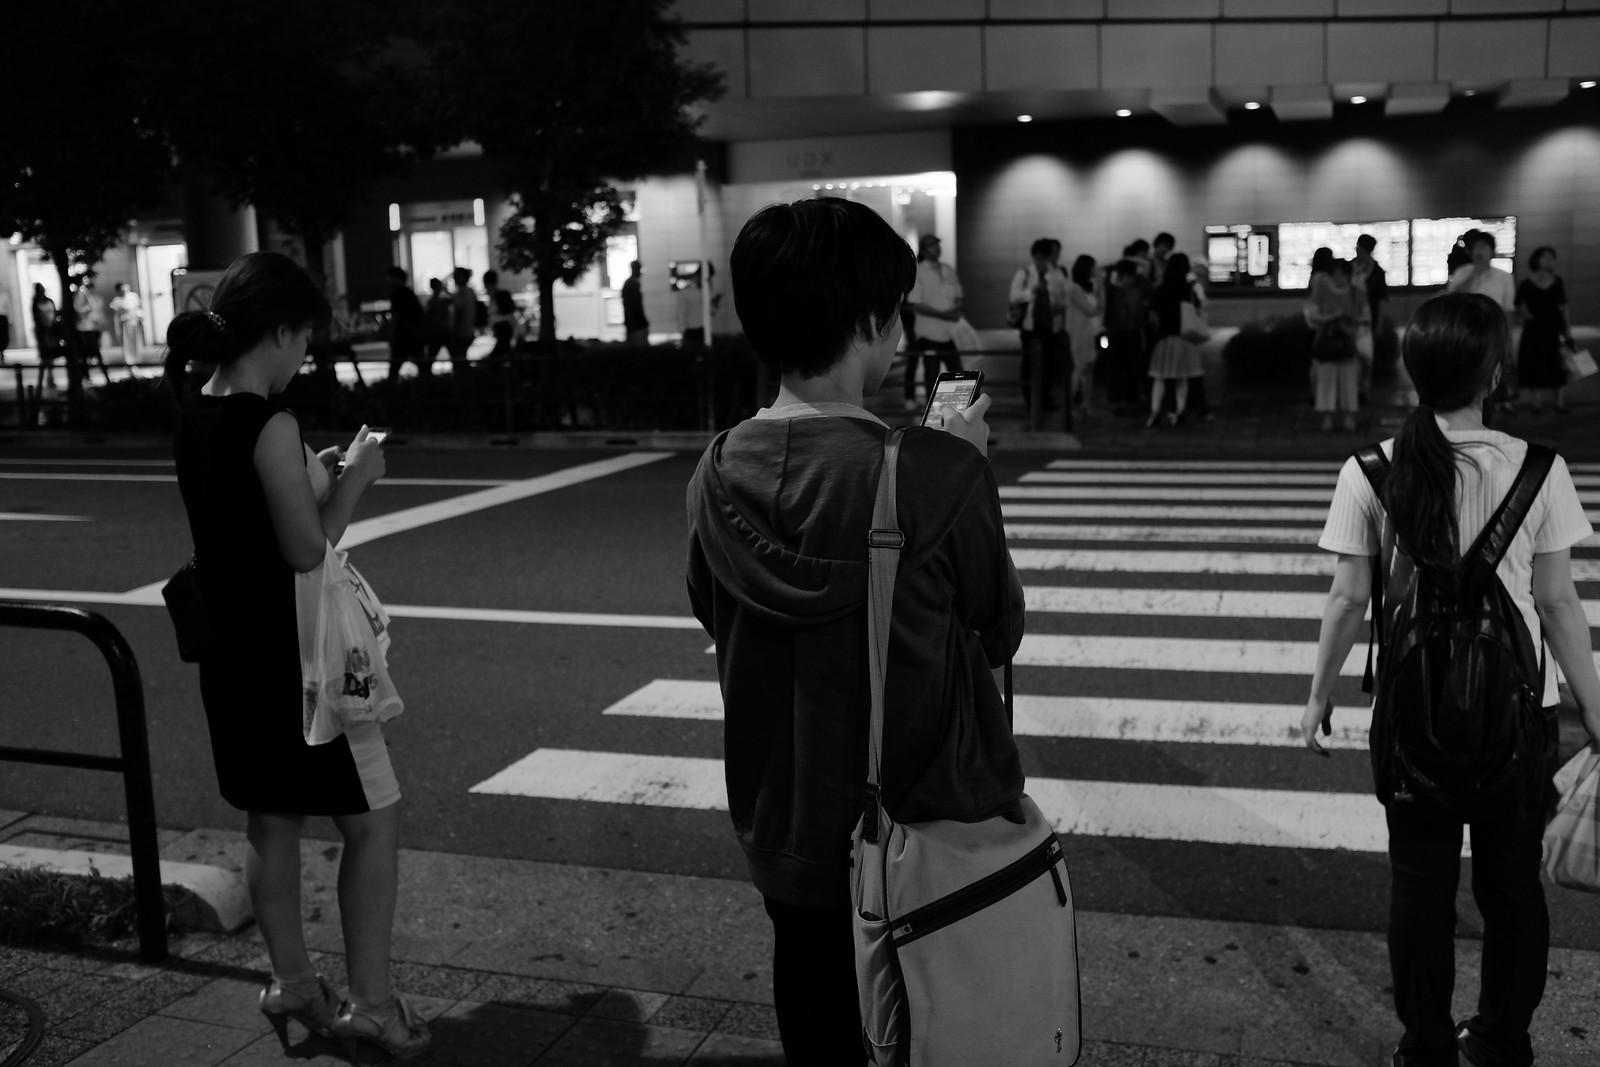 The Akihabara taken by FUJIFILM X100S.